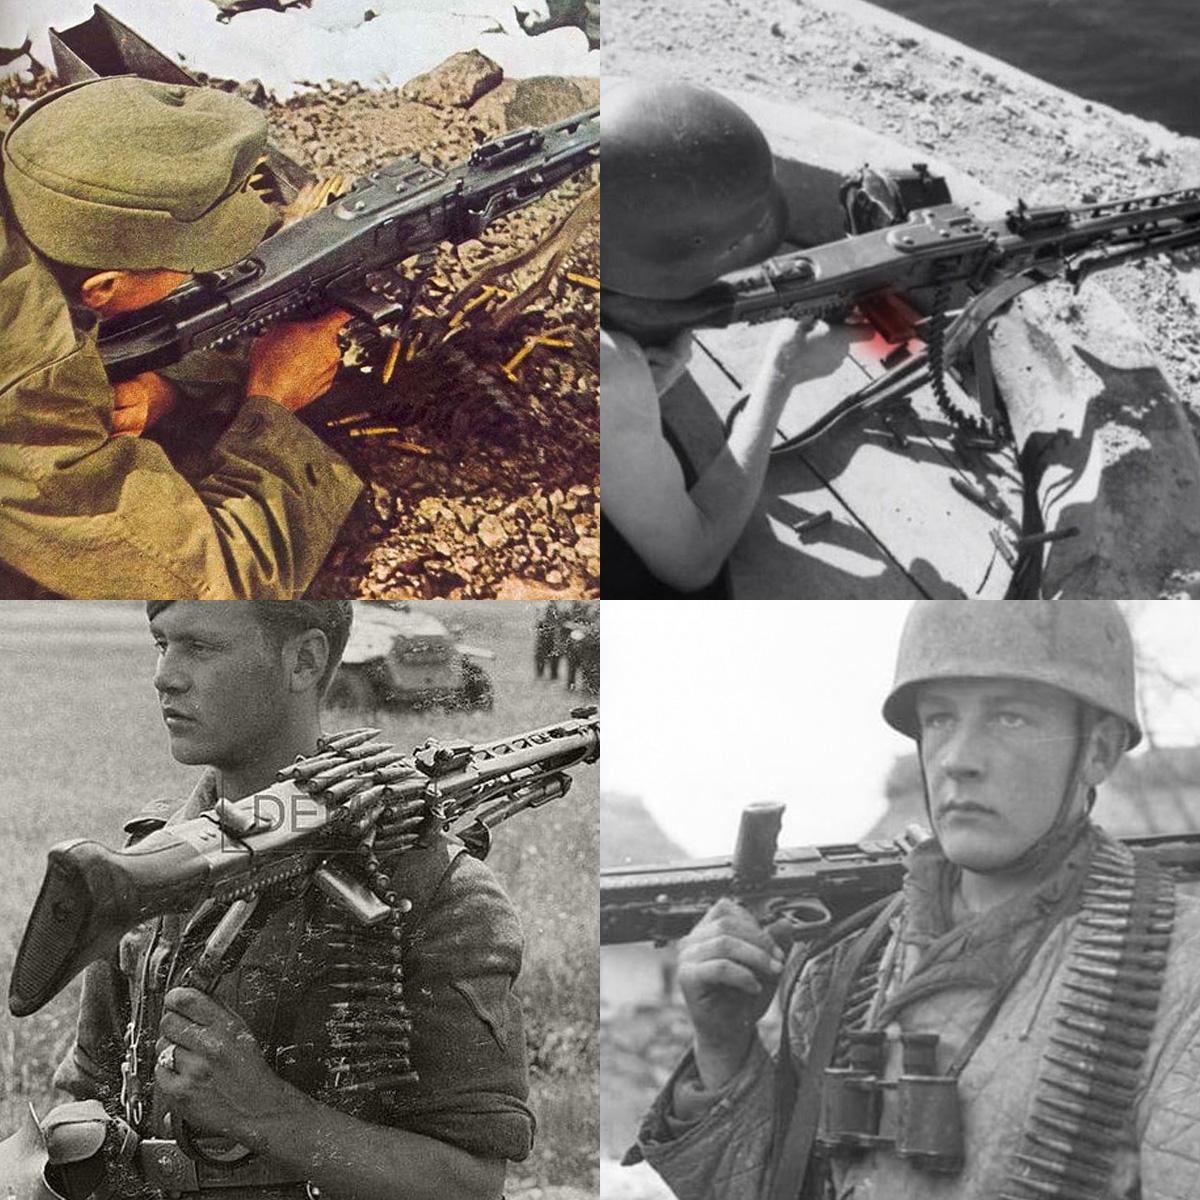 MG42 CHARGING HANDLE